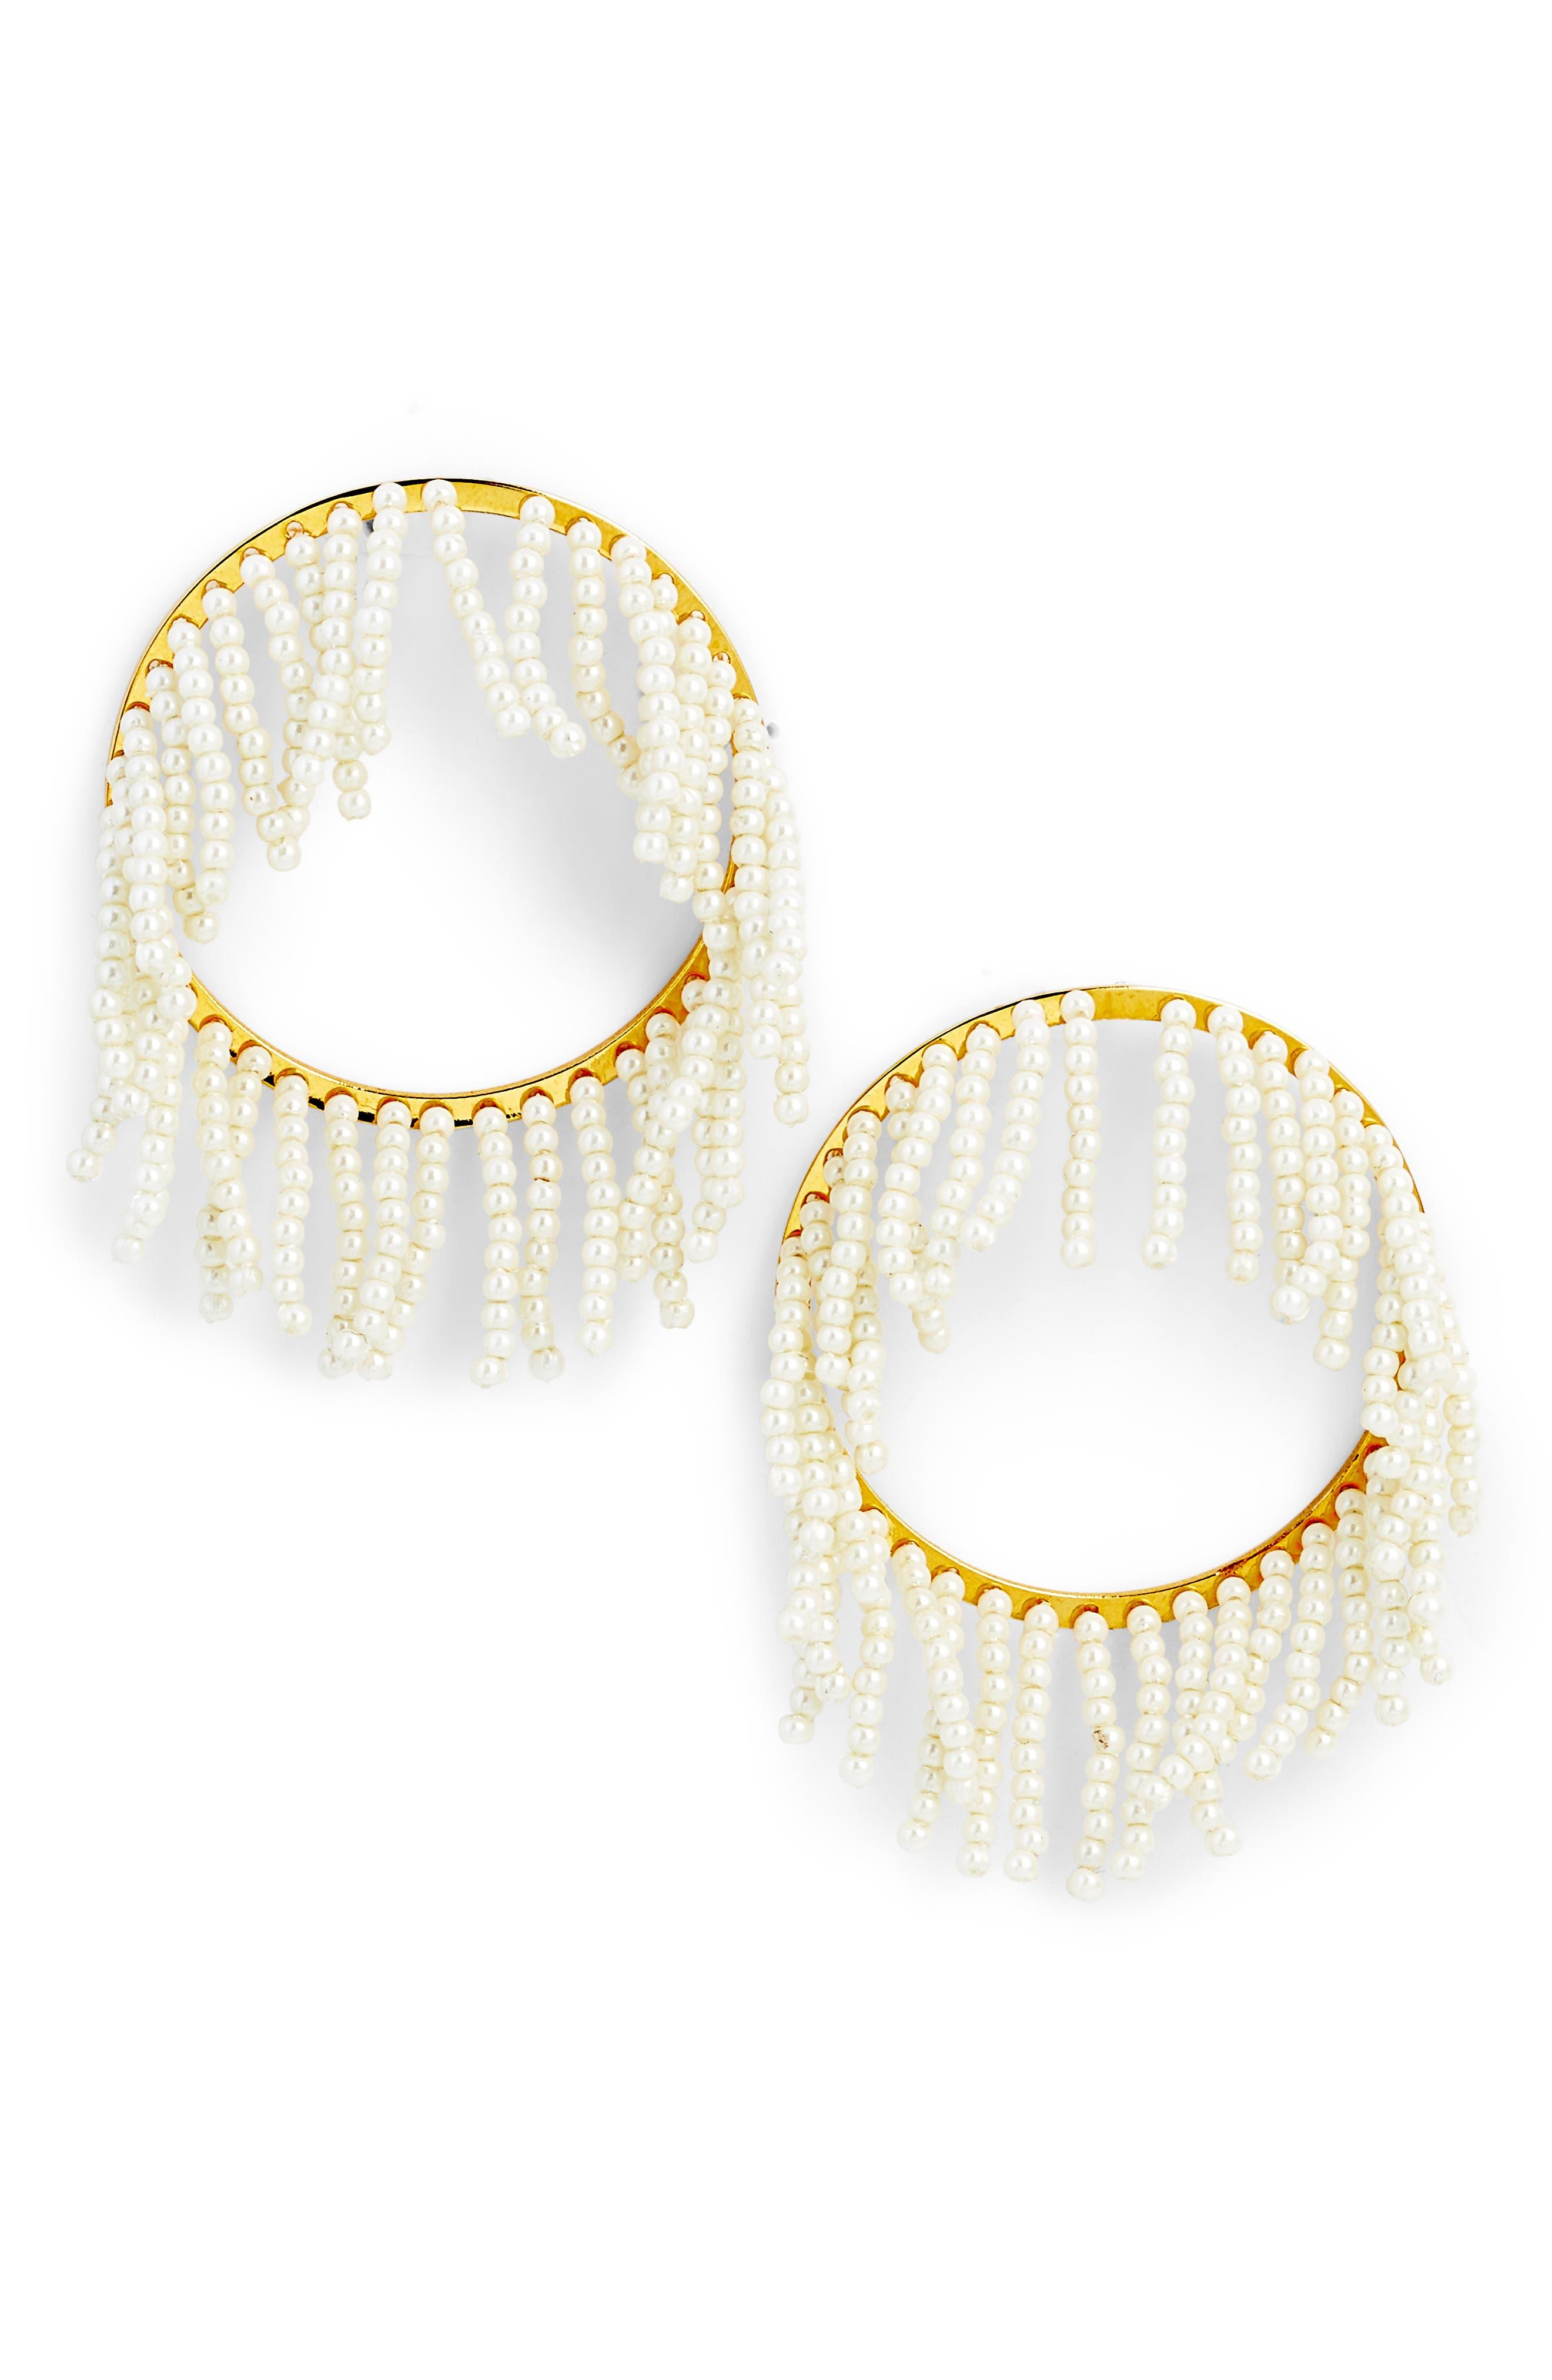 Imitation Pearl Hoop Earrings,                             Main thumbnail 1, color,                             Pearl